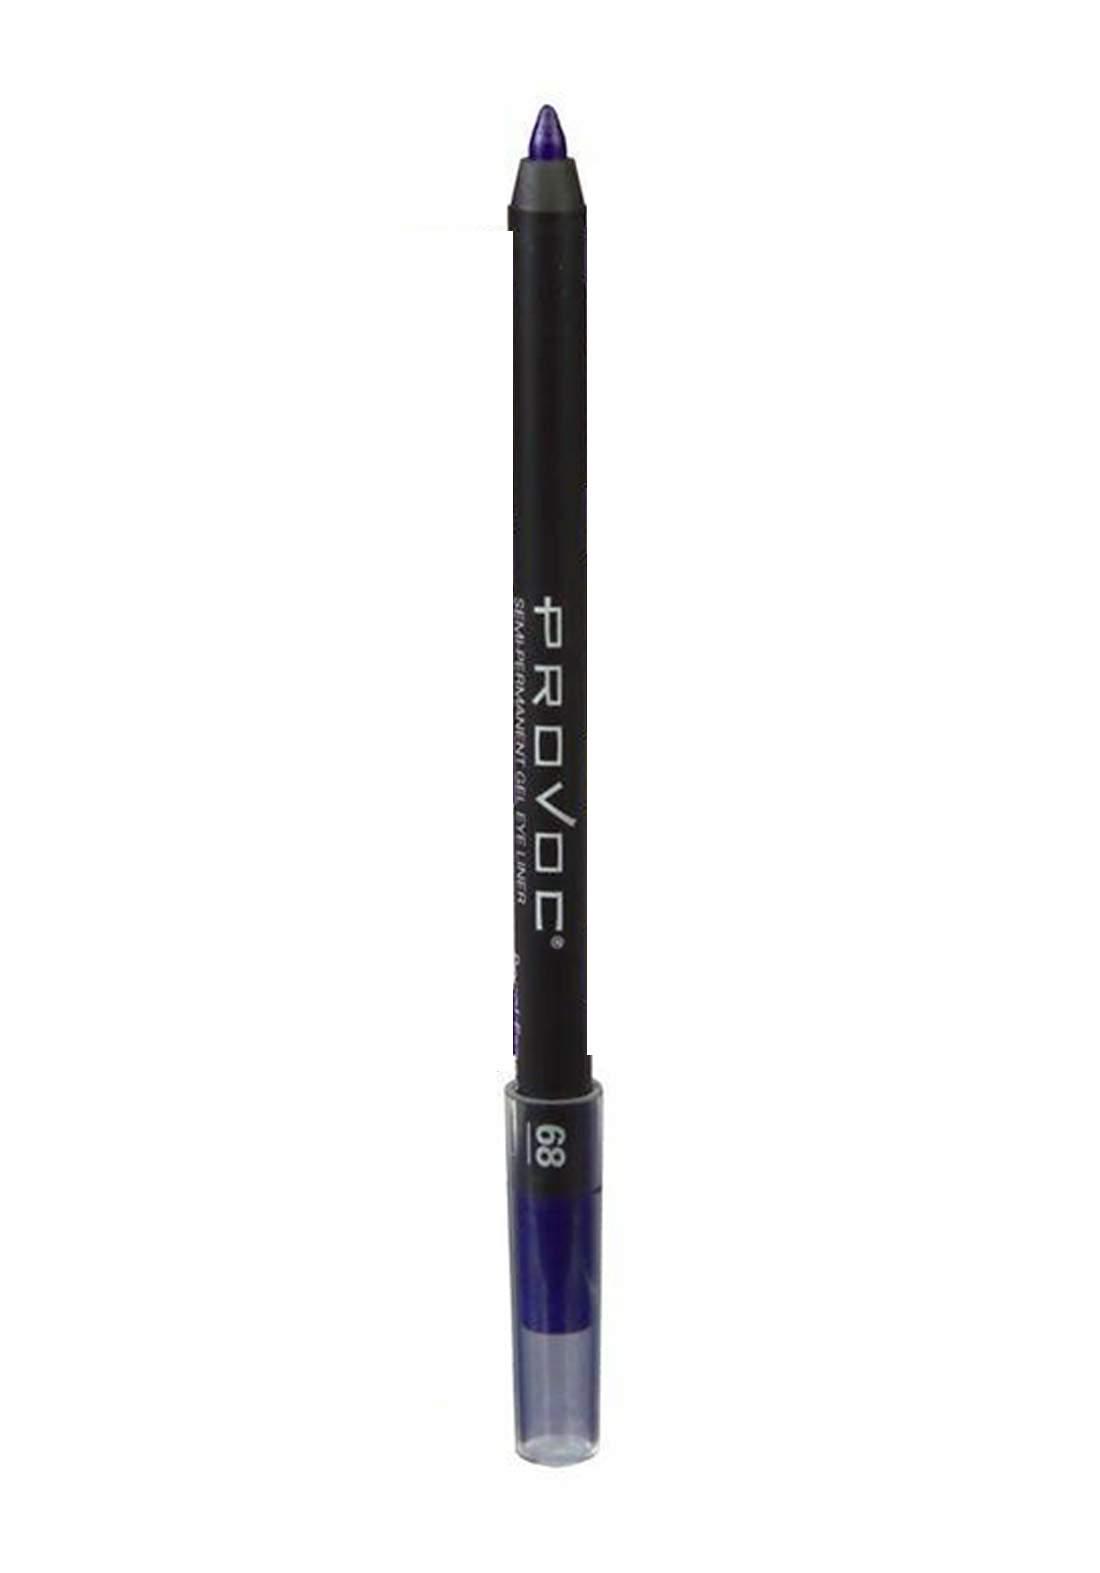 Provoc 353-0071 Semi-Permanent Gel Waterproof Eyeliner No.68 Royal Engagement قلم تحديد العيون